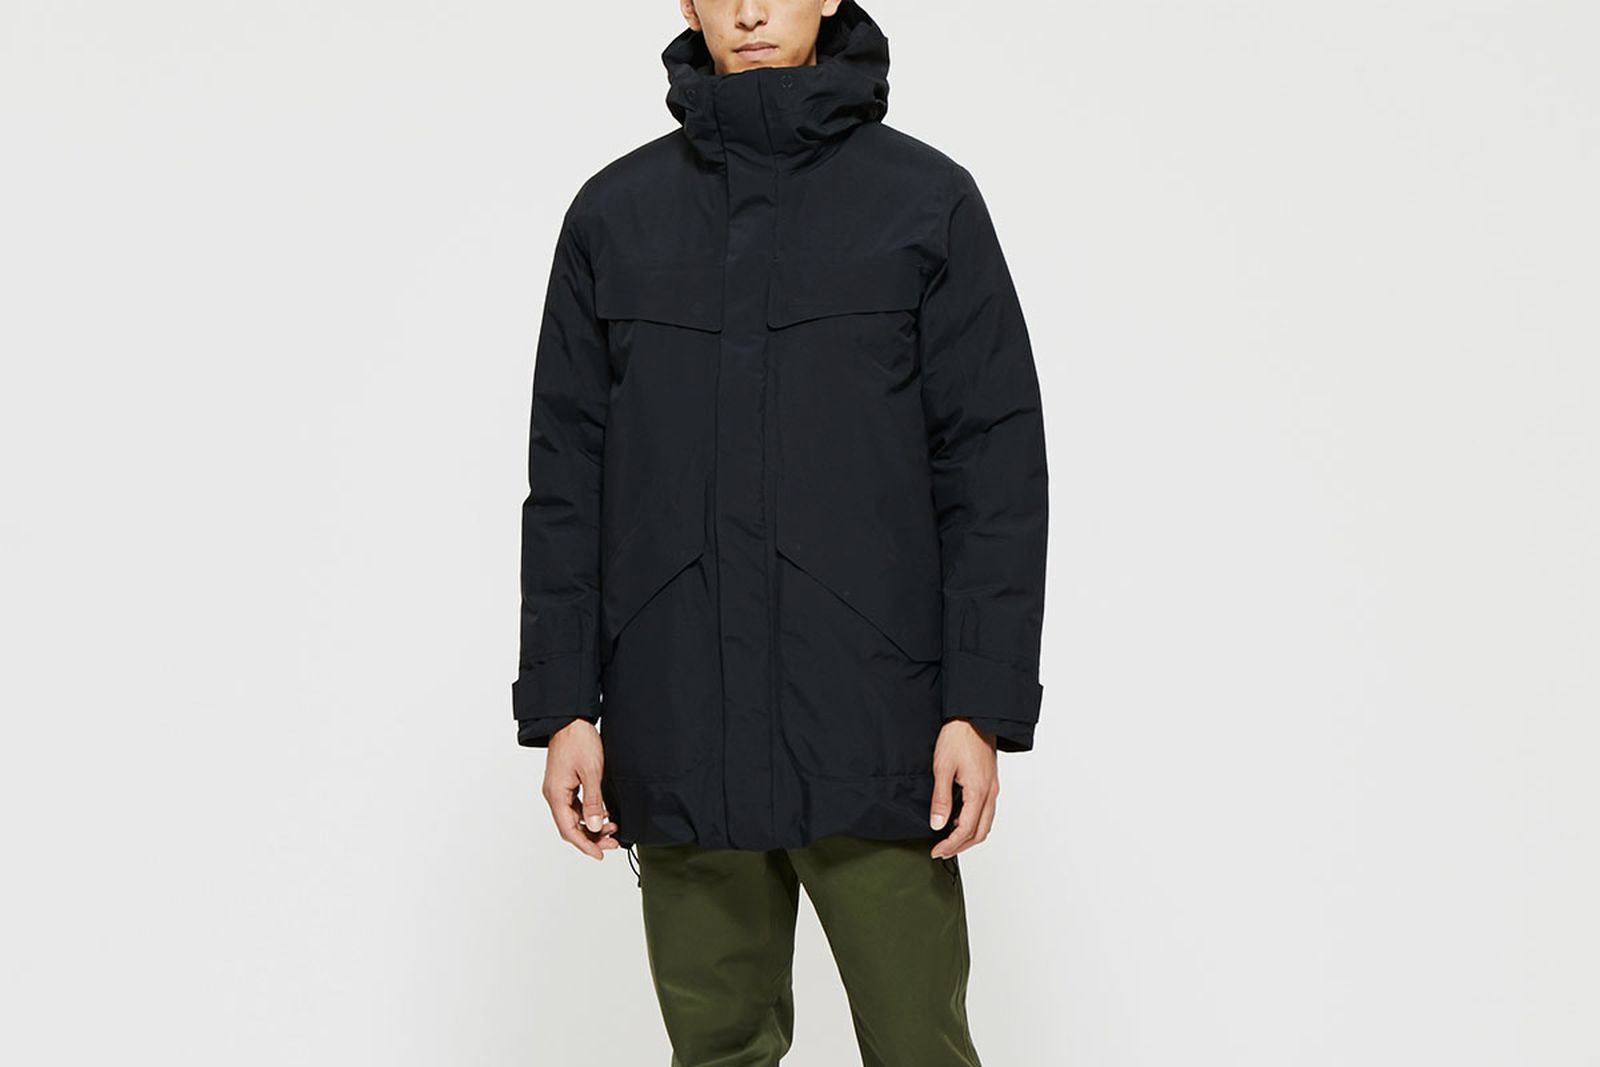 japanese-outerwear-goldwin-san-francisco-lifestyle-4